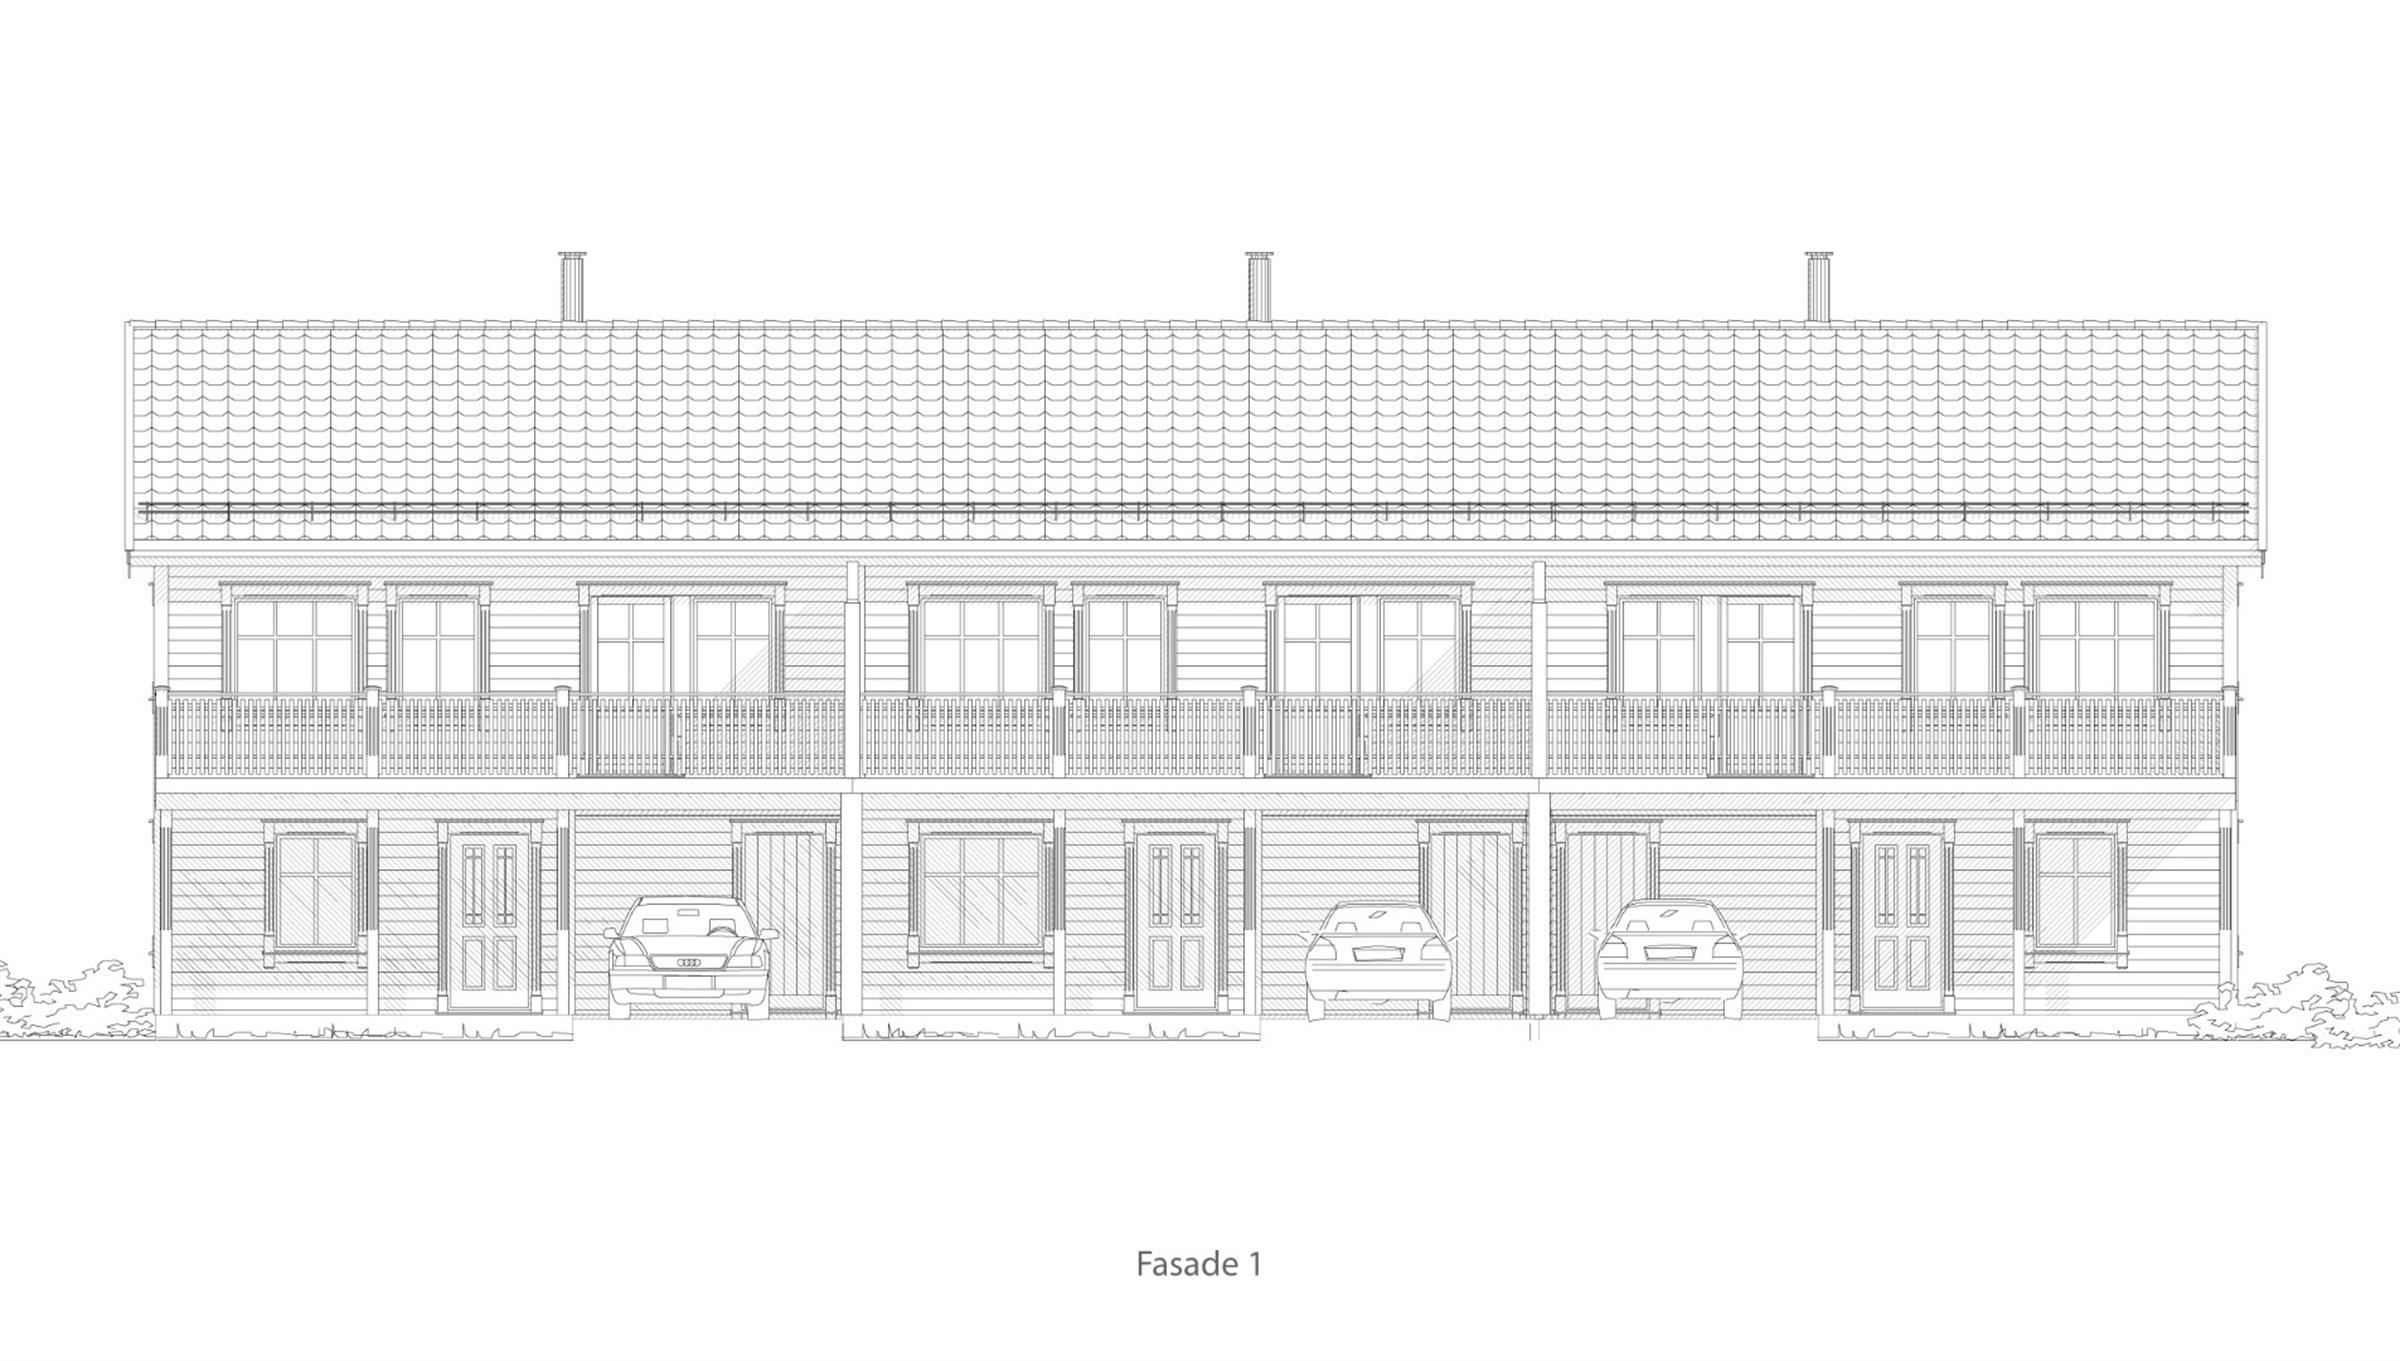 Hamar fasade 1